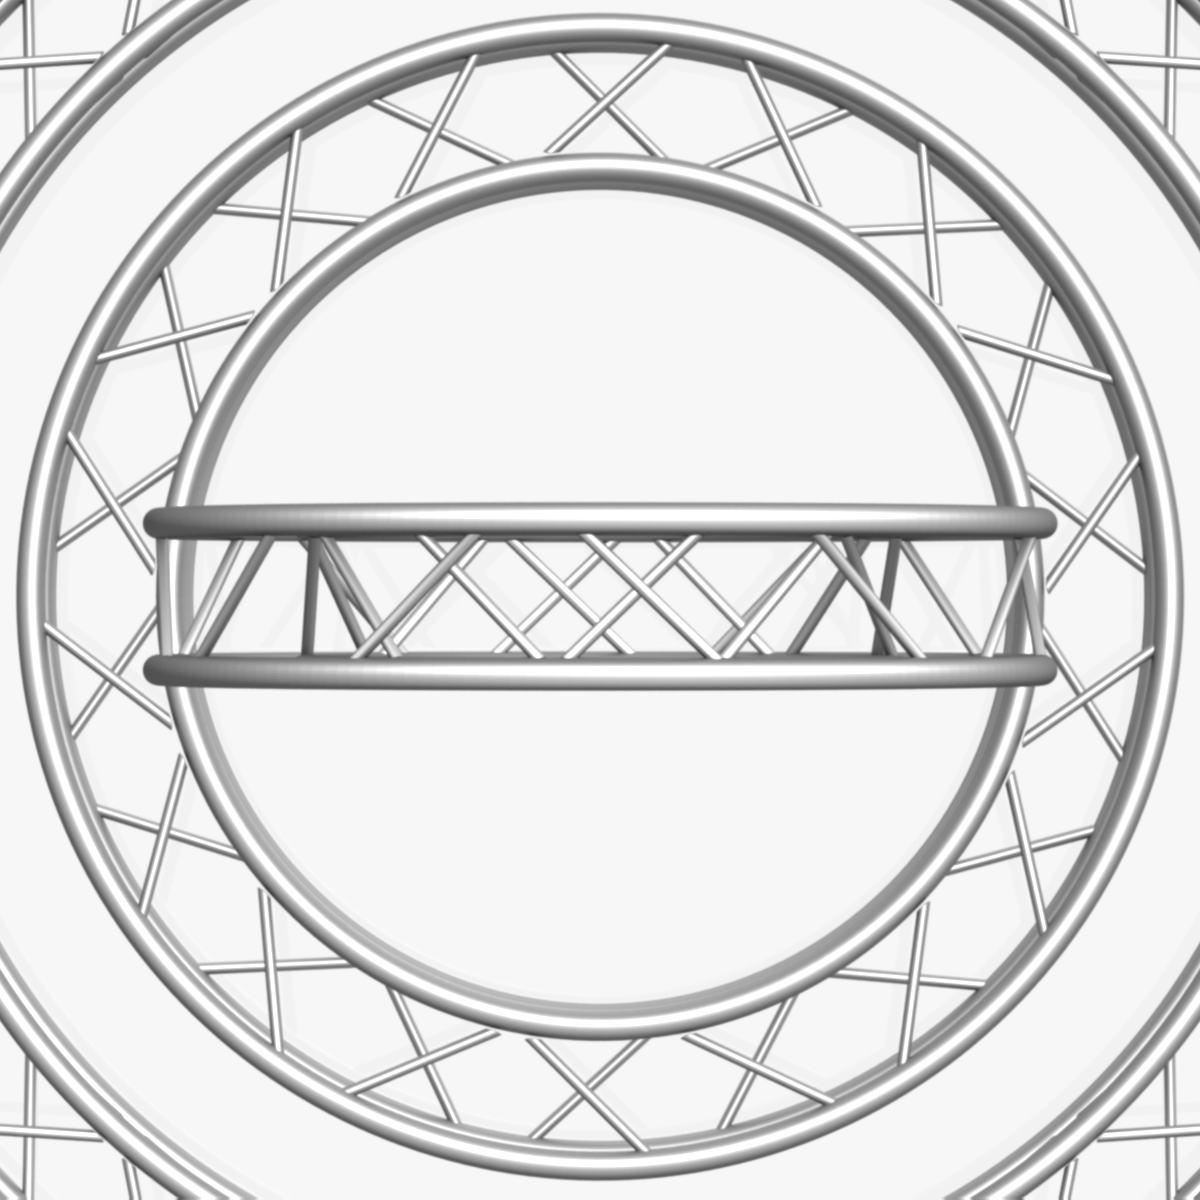 circle square truss modular collection 3d model 3ds max dxf fbx c4d dae  texture obj 252349